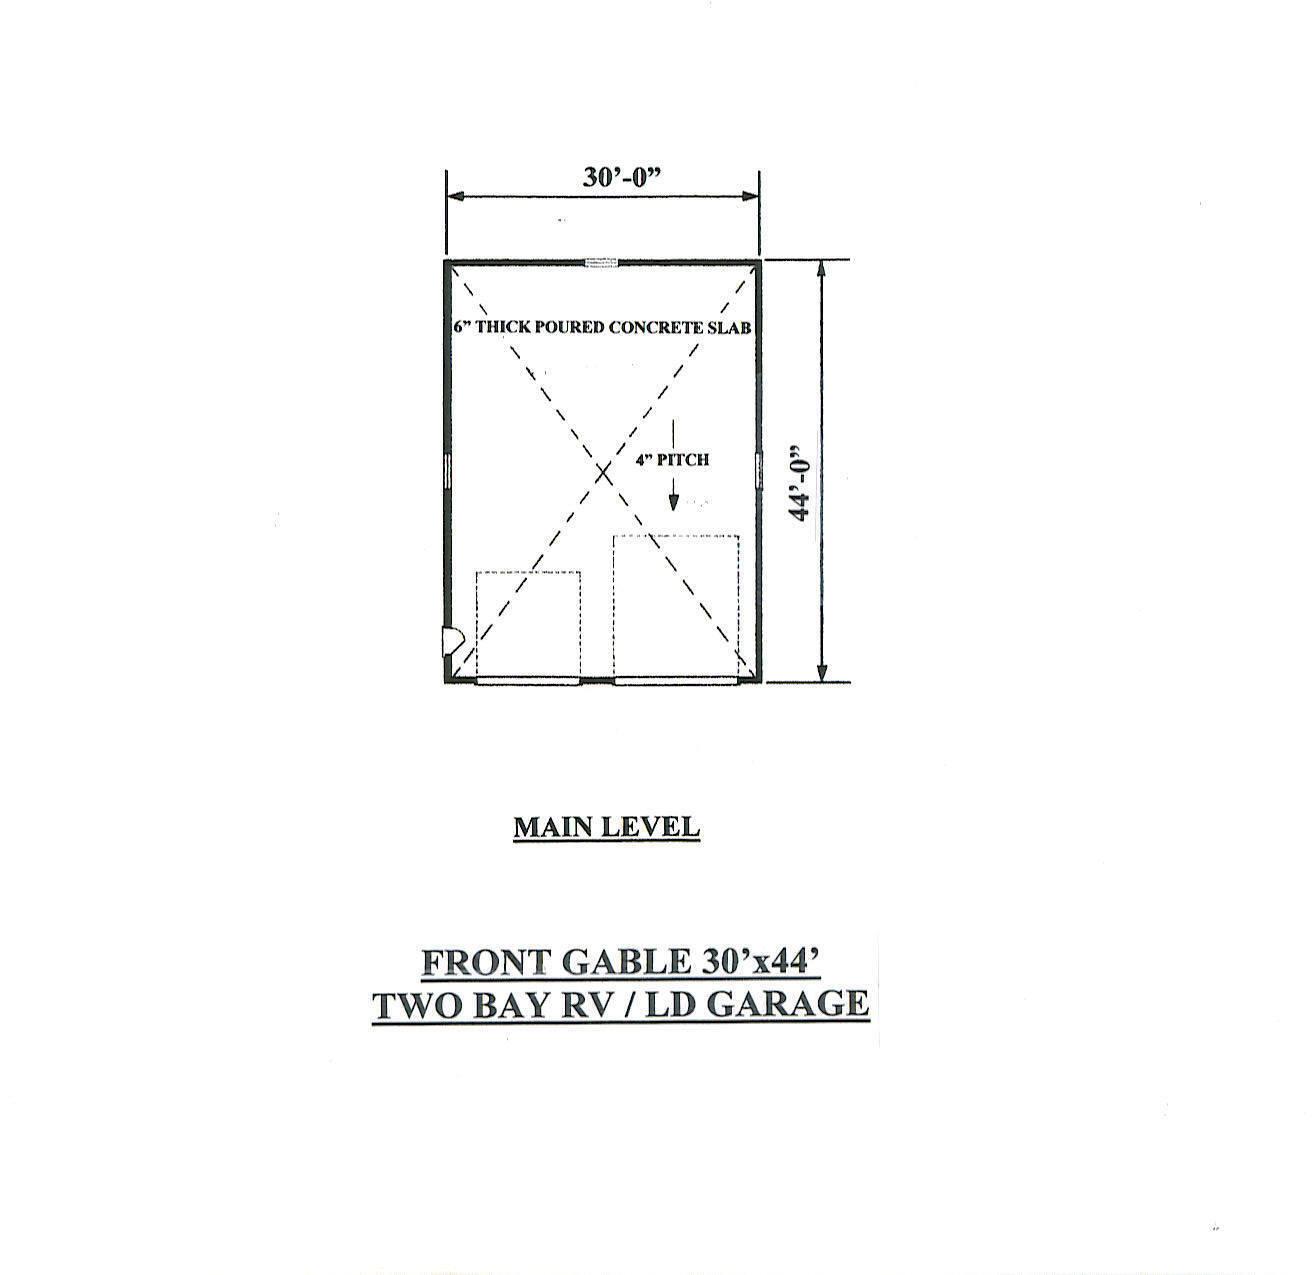 30 x 44 Two Two Two Bay FG / RV Garage Building Blauprint Plans 32a0ac